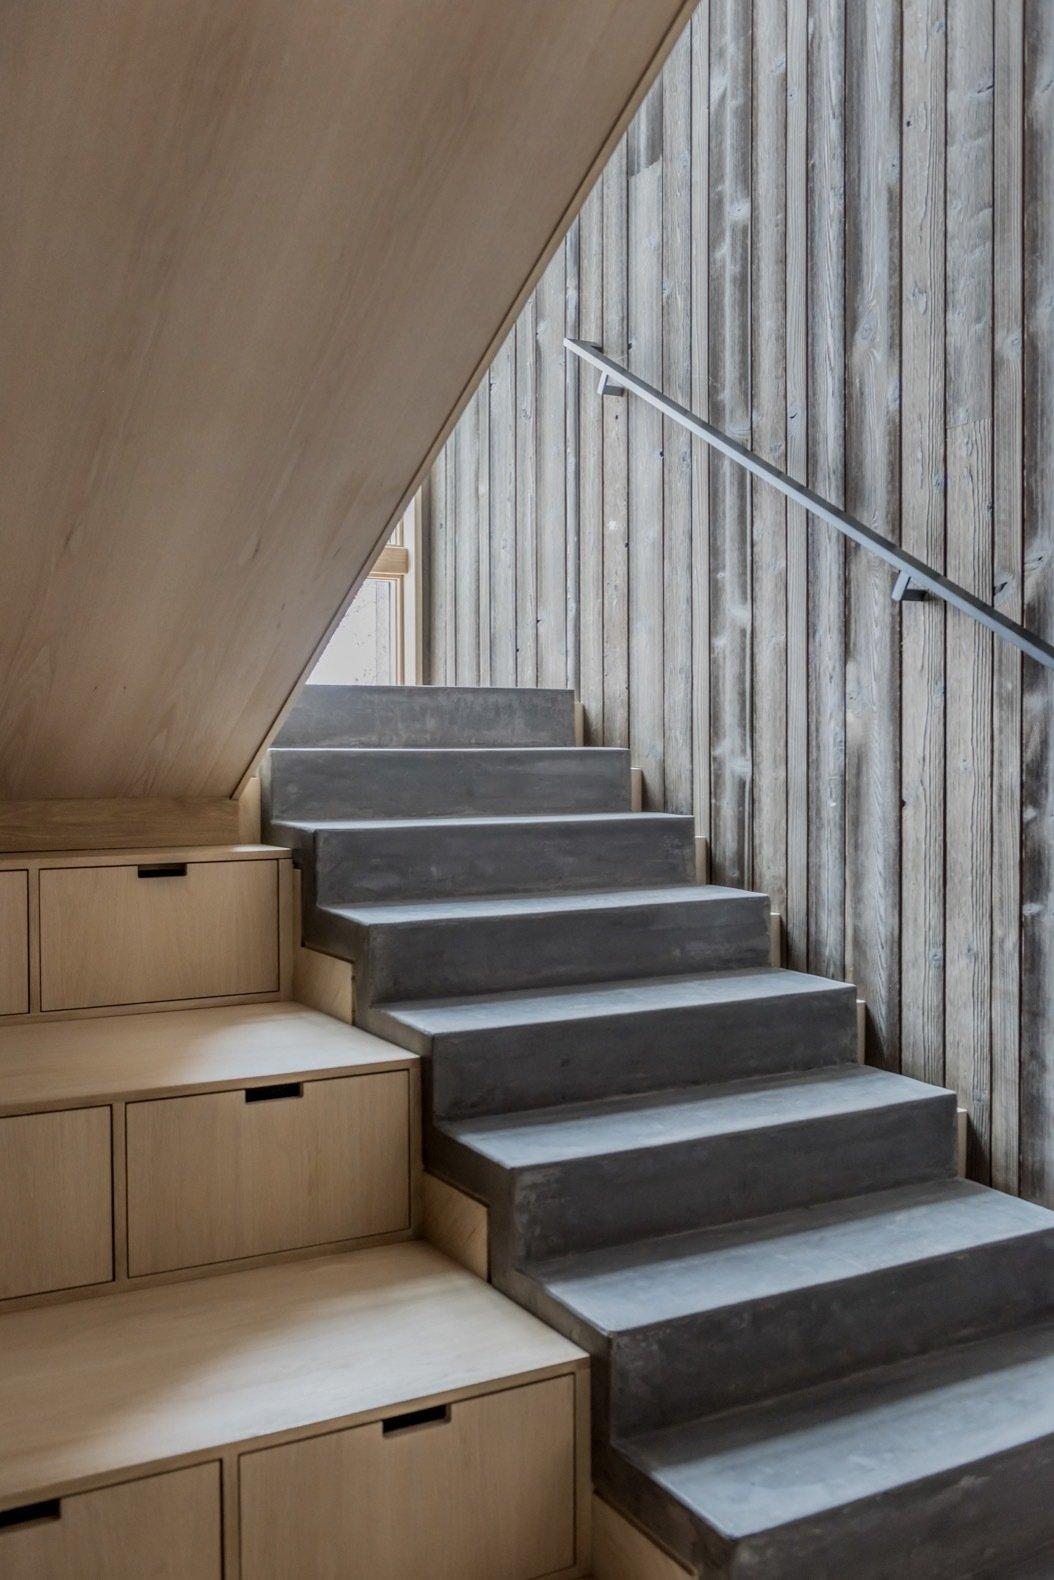 Gammel Dam concrete stairs